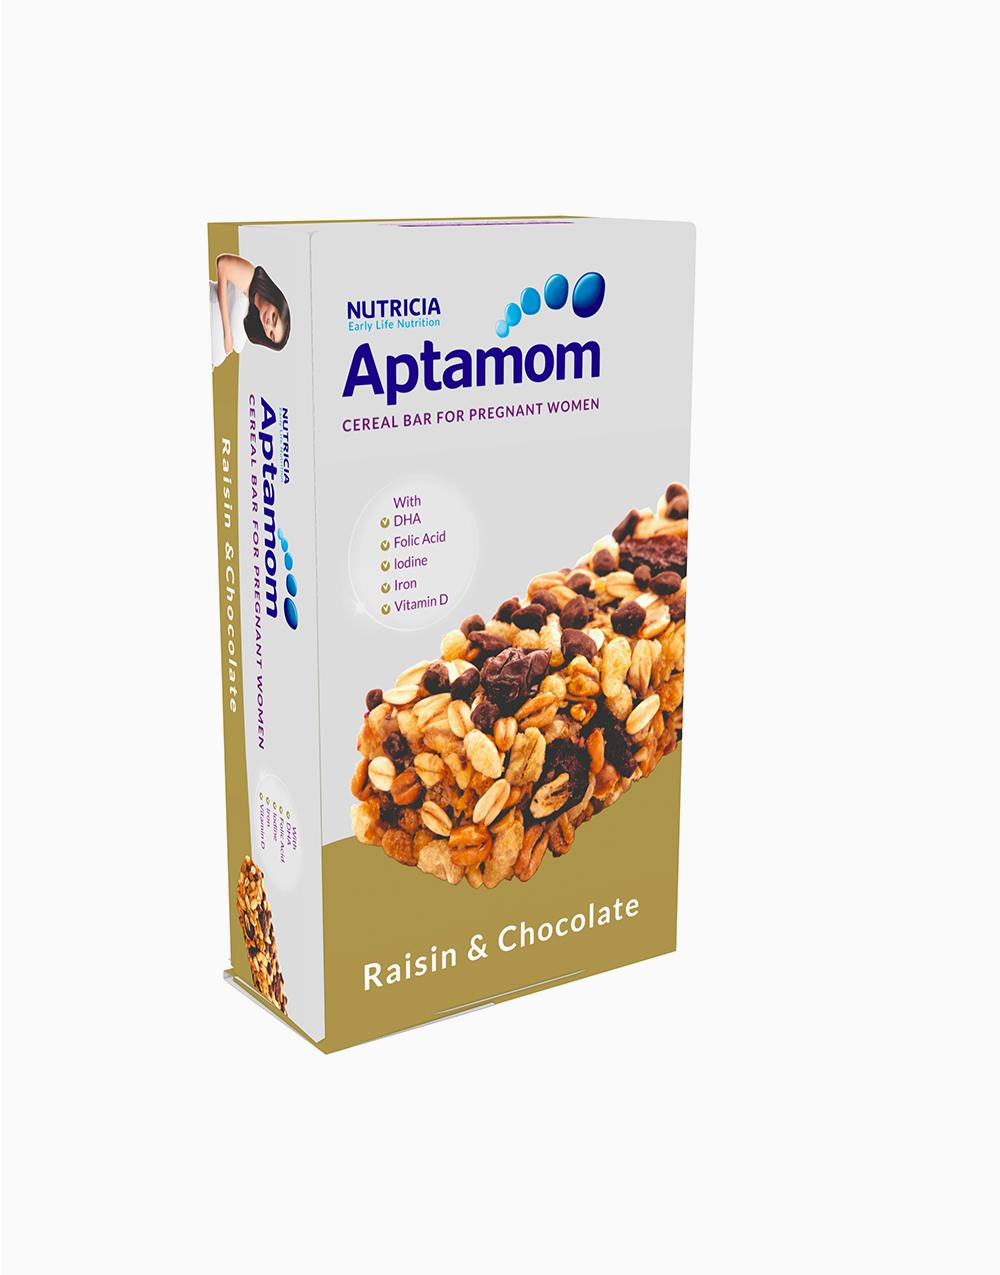 Aptamom Cereal Bar - Raisin and Chocolate with DHA (40g x 18) by Nutricia